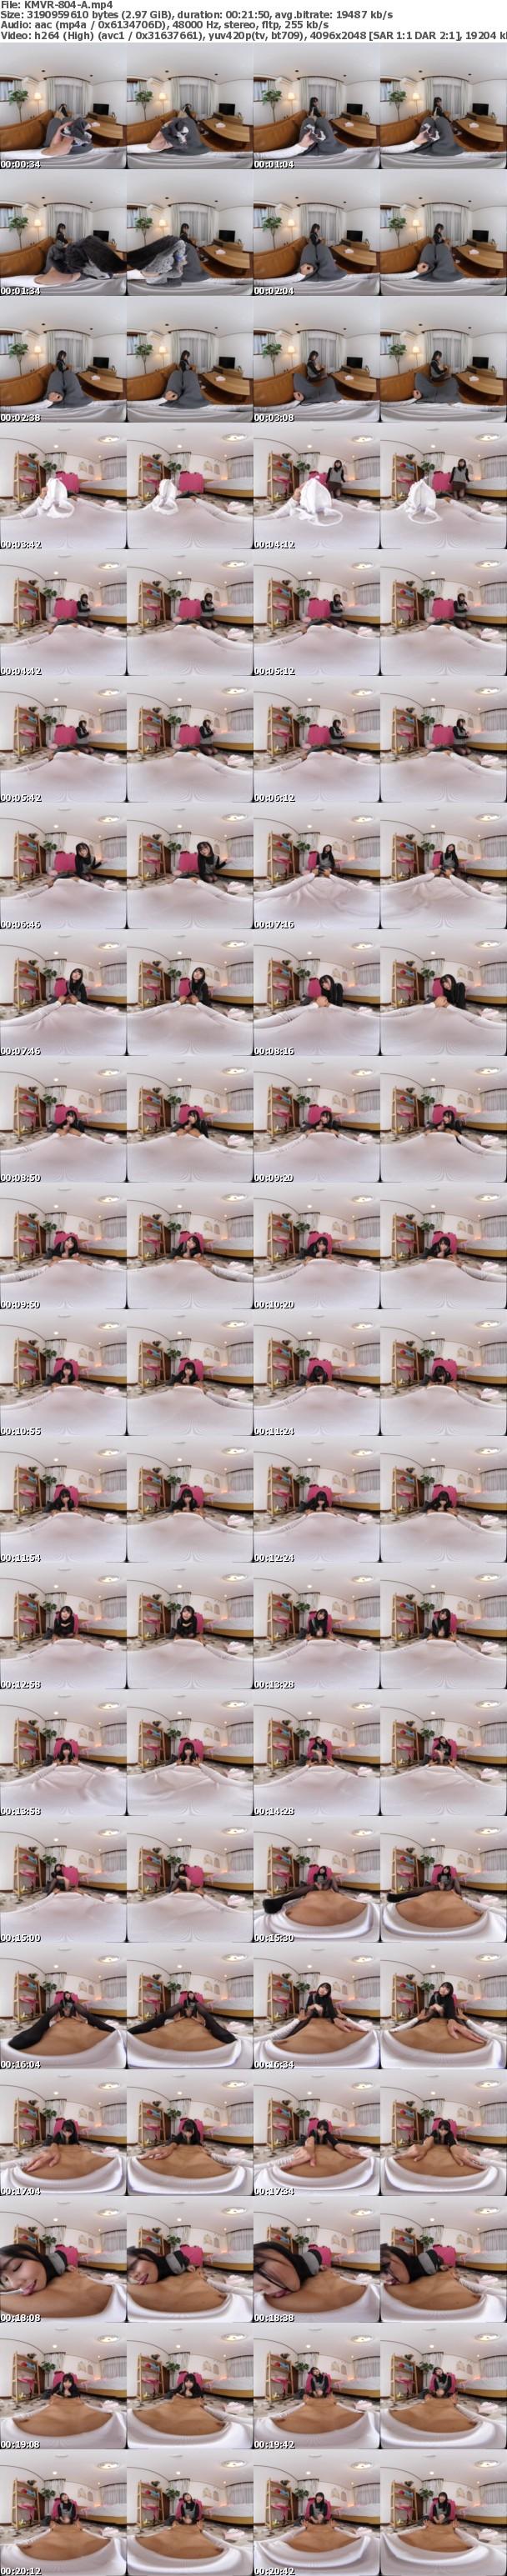 (VR) (LR) KMVR-804 「イッてるってば!」欲情し連続10射精ッ!!!暴走ち○ぽで追撃イキっ、本気ま○こで追撃射精っ!! 枢木あおい